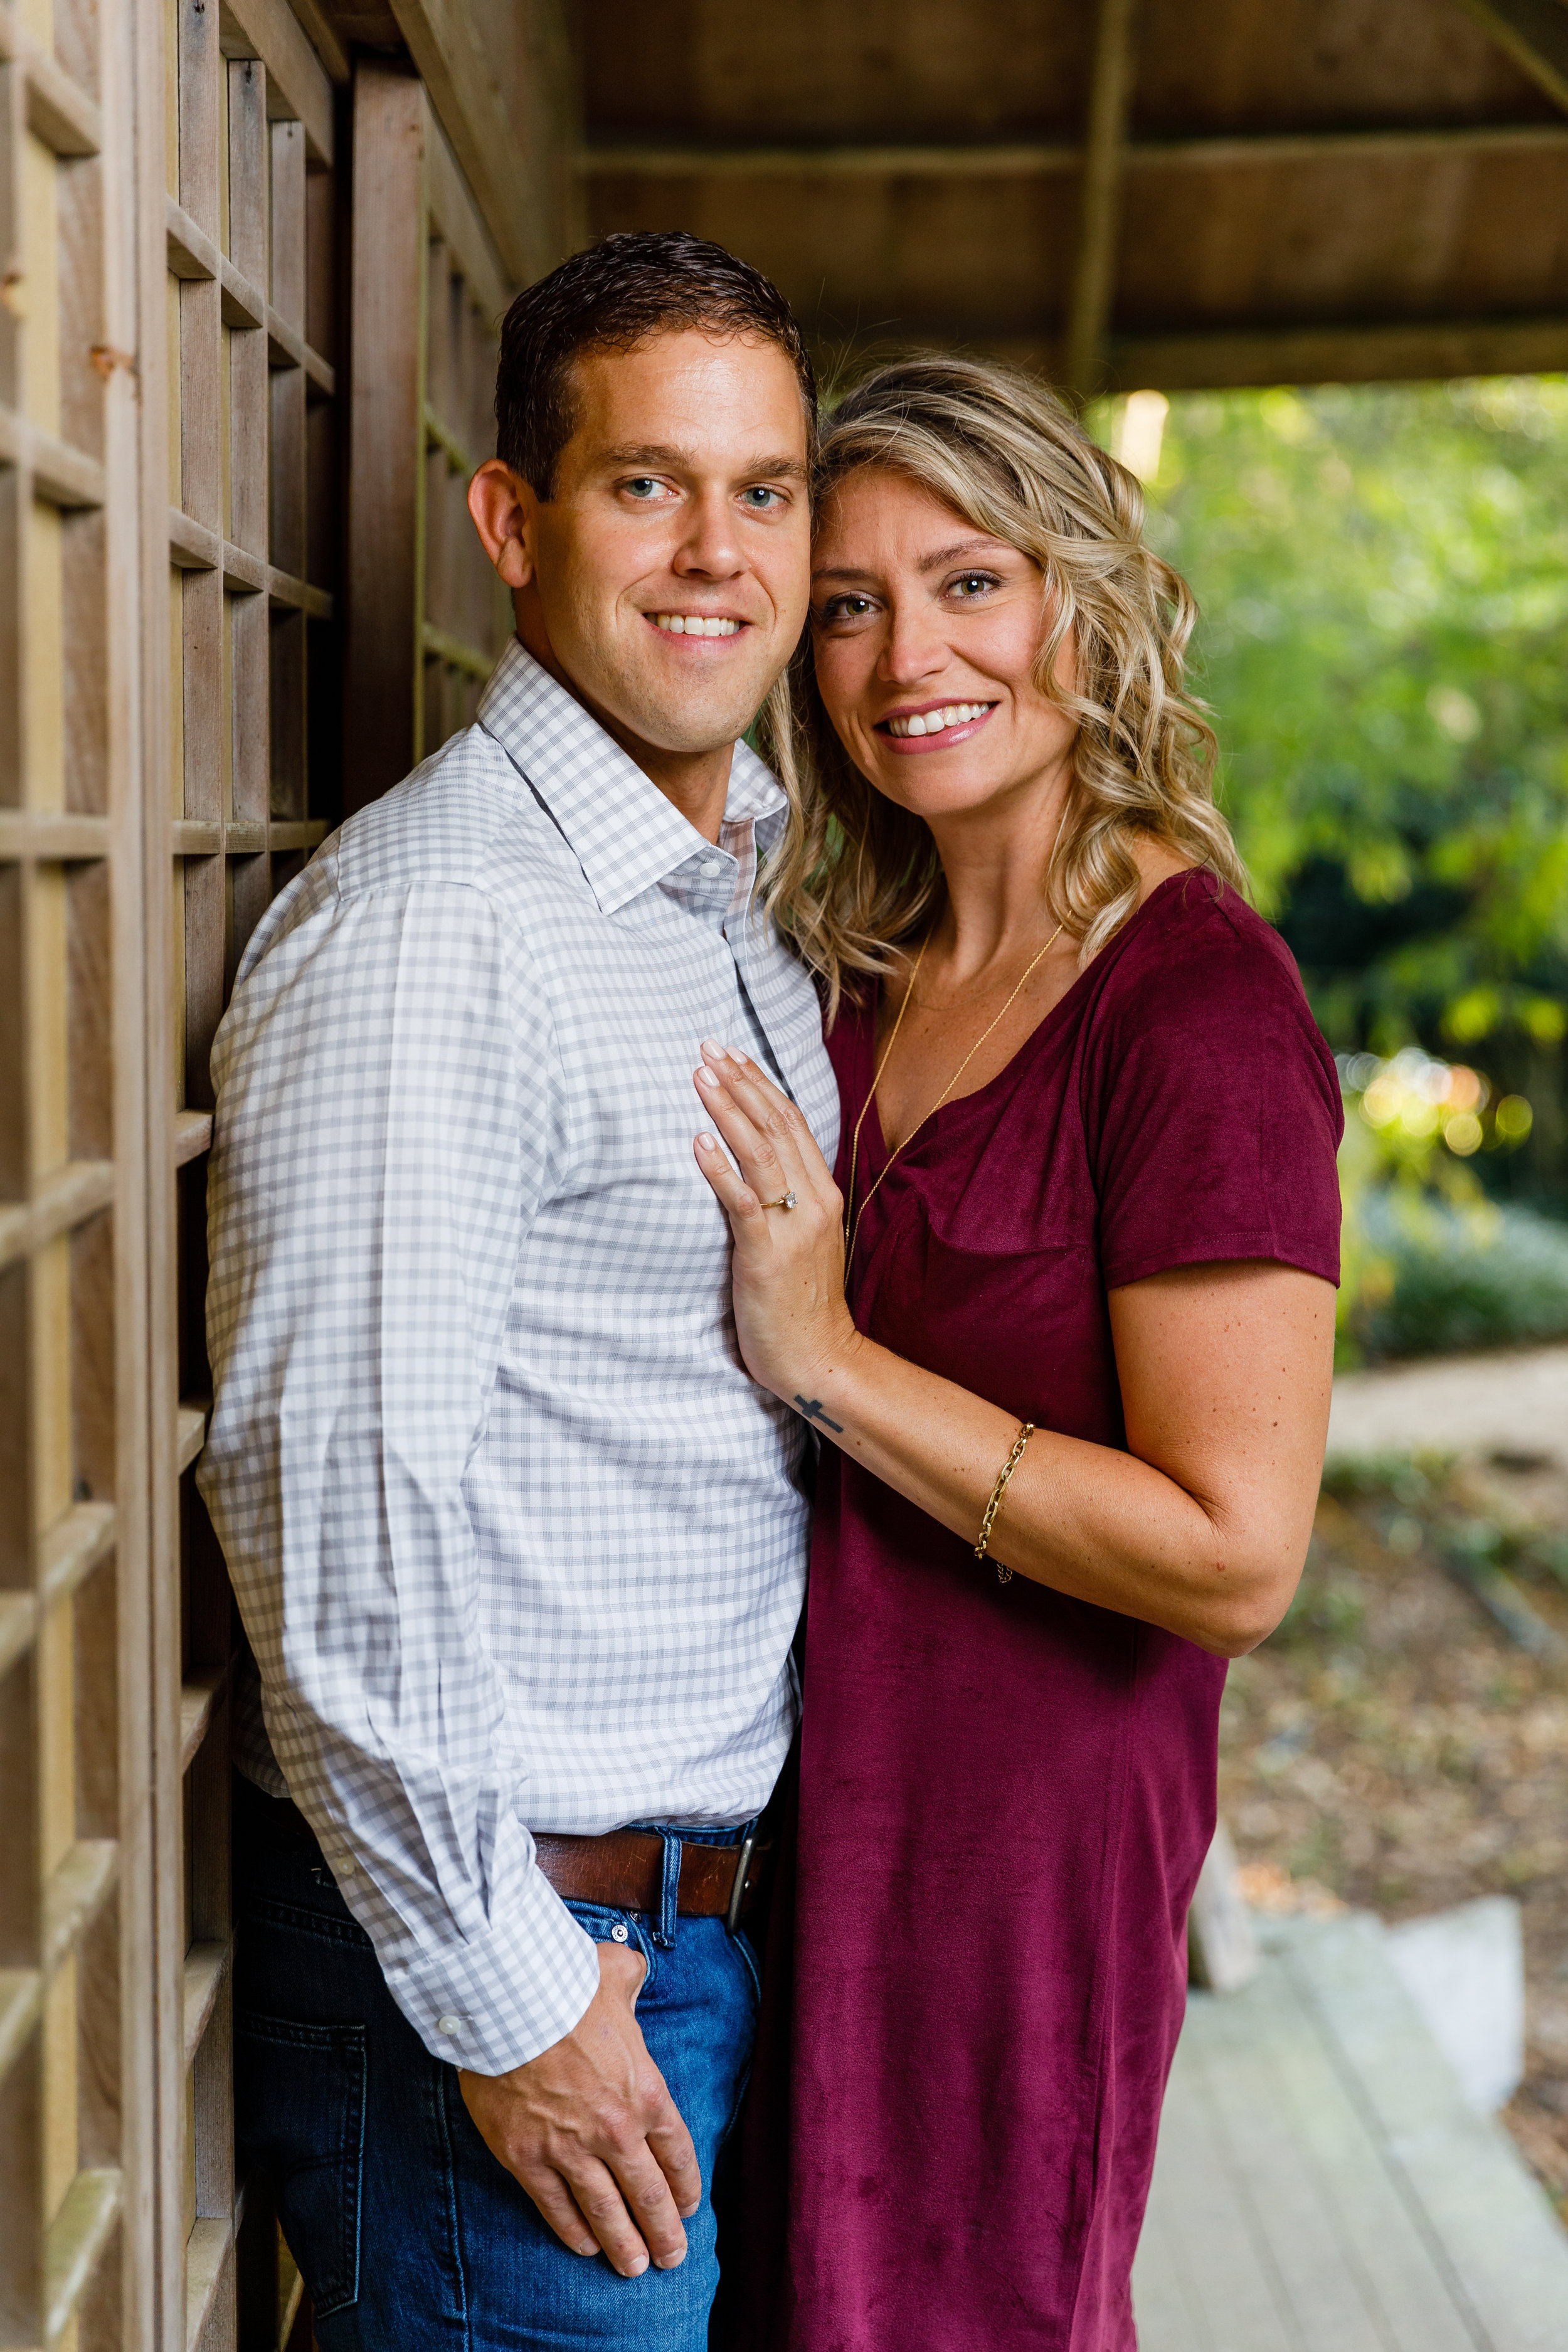 Youngsville-lafayette-portrait-family-wedding-photographer-8930.jpg